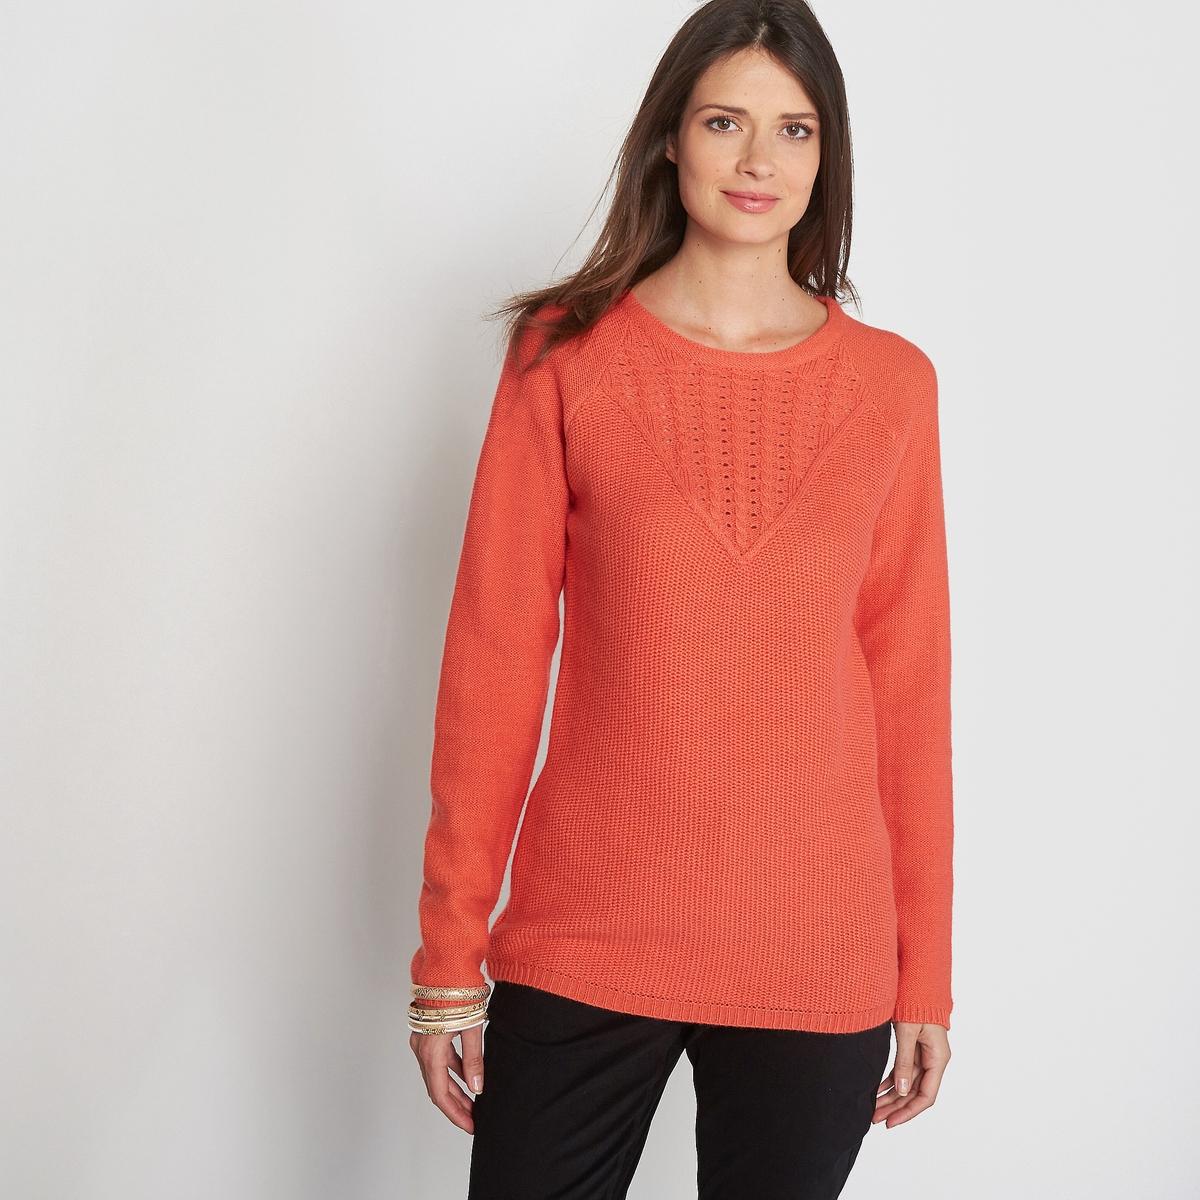 Пуловер из оригинального трикотажа, 15% шерсти